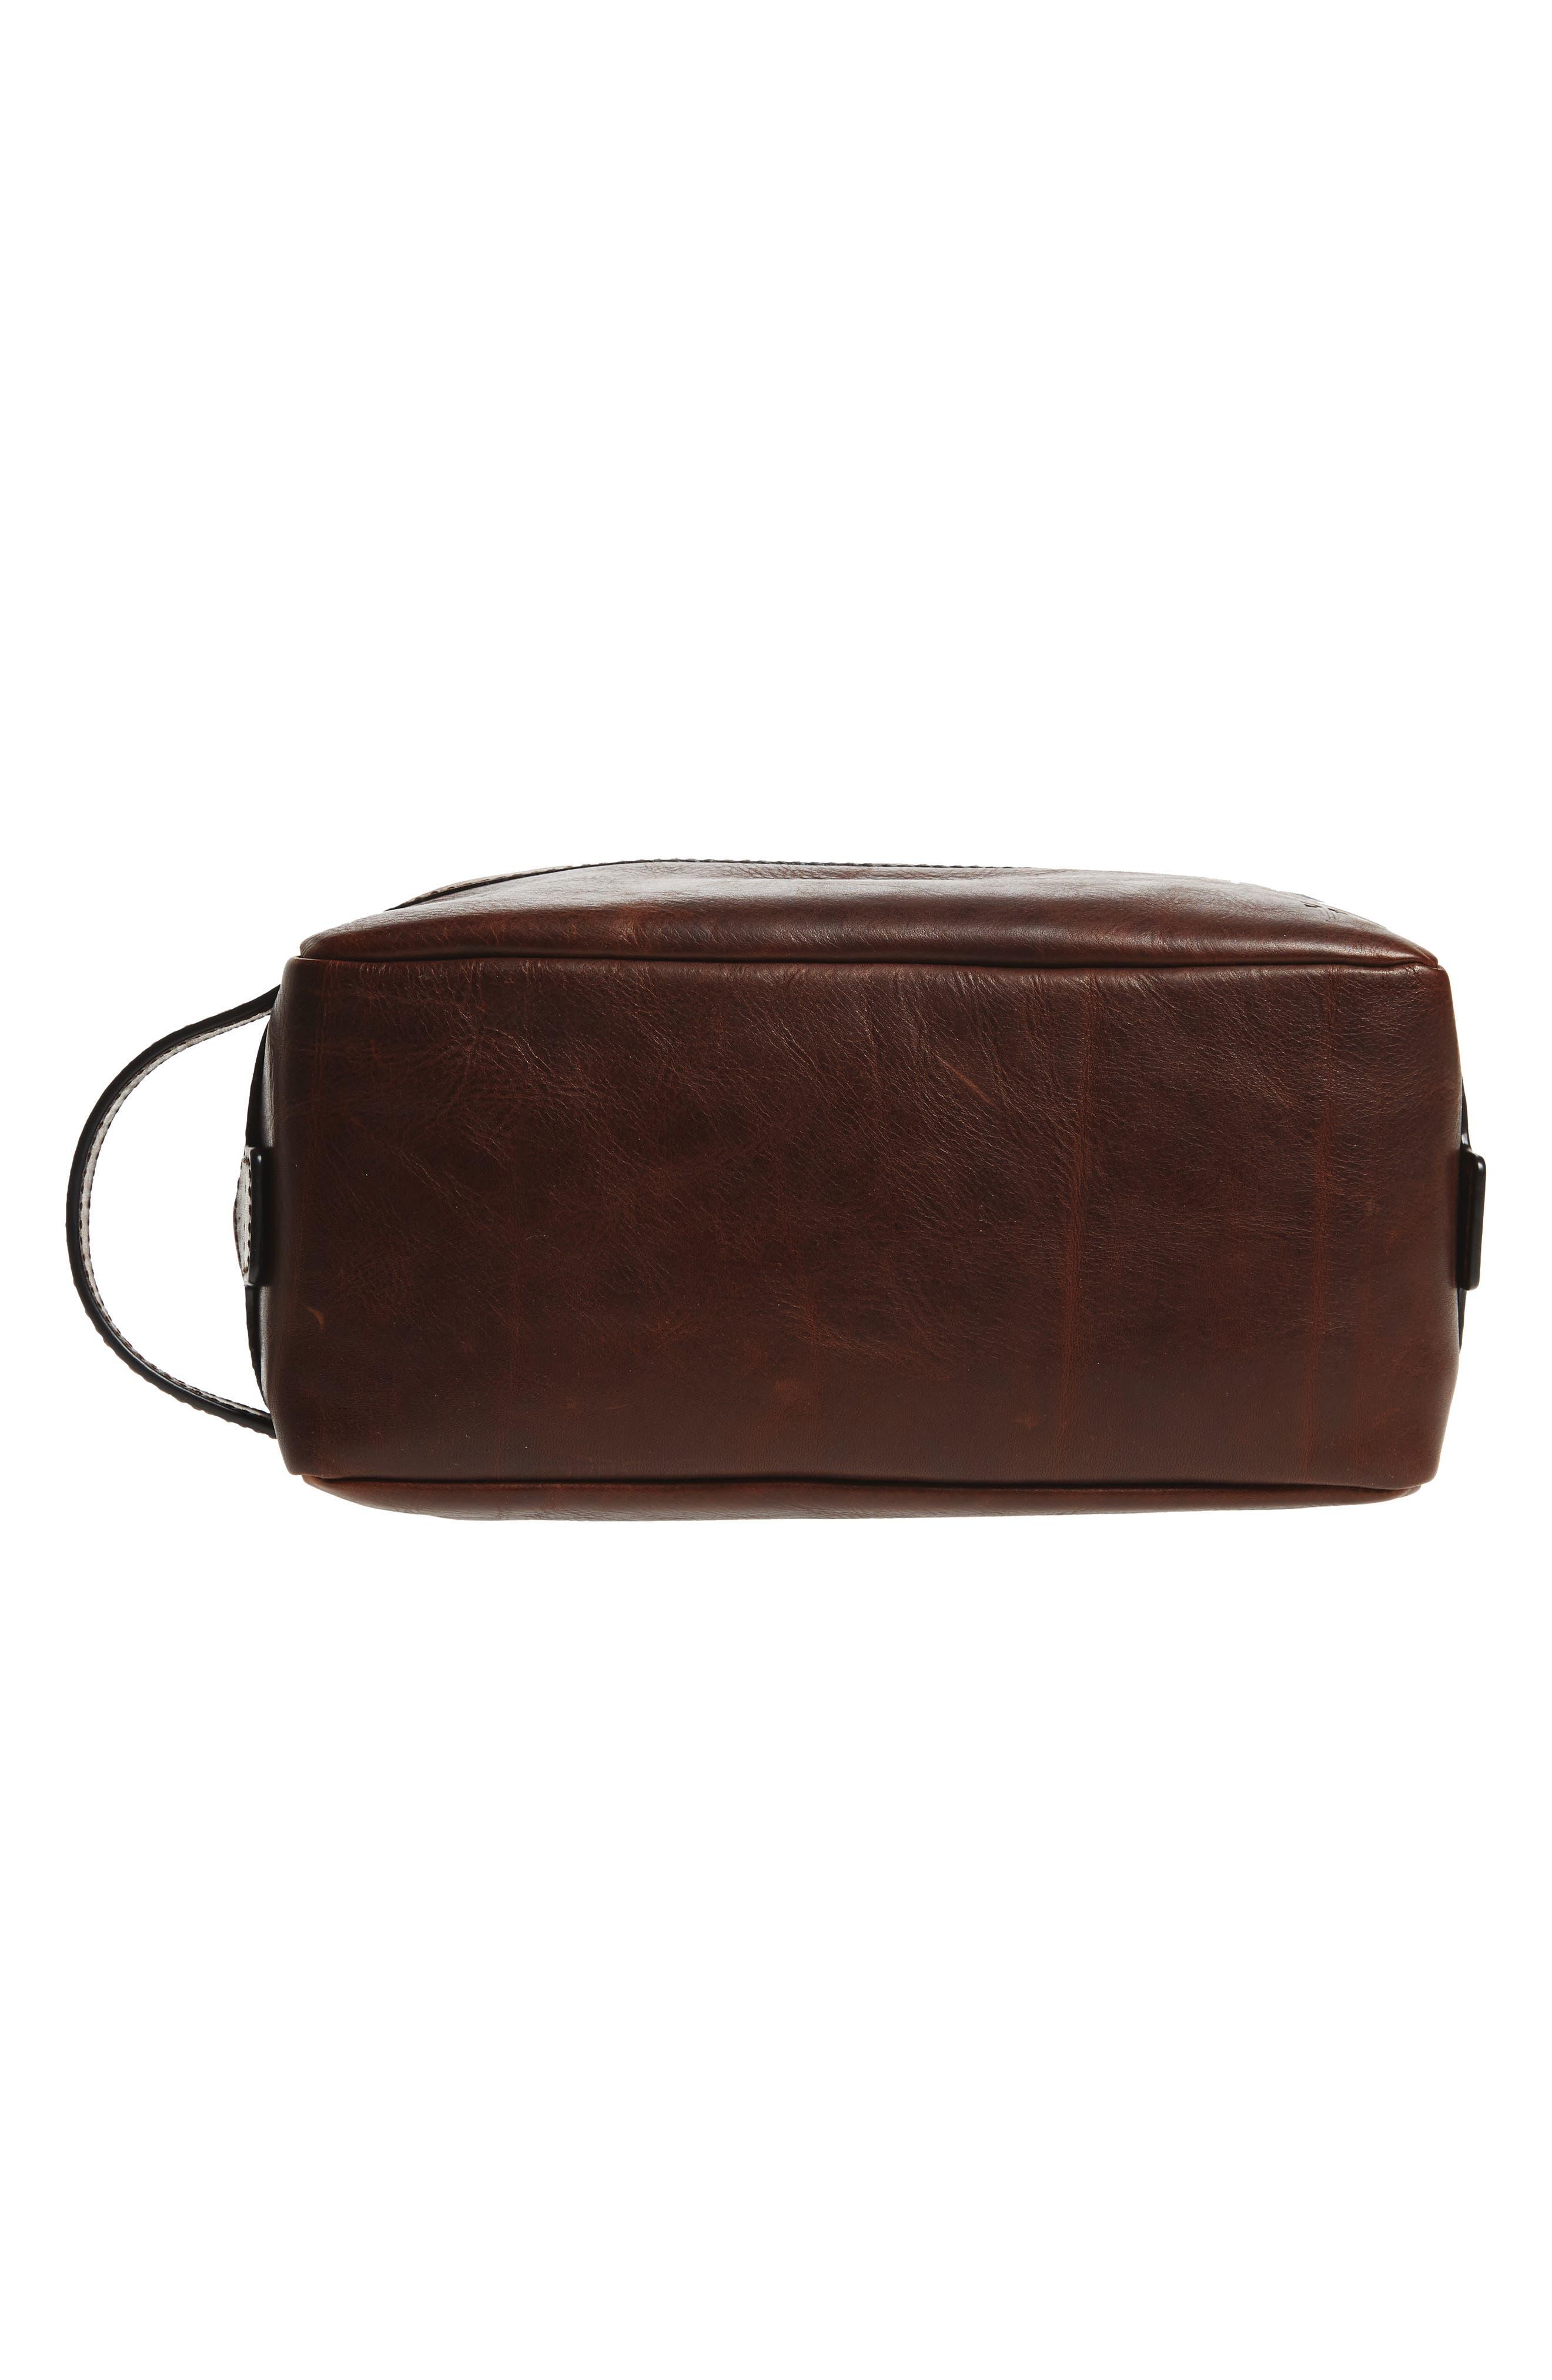 'Logan' Leather Travel Kit,                             Alternate thumbnail 5, color,                             DARK BROWN